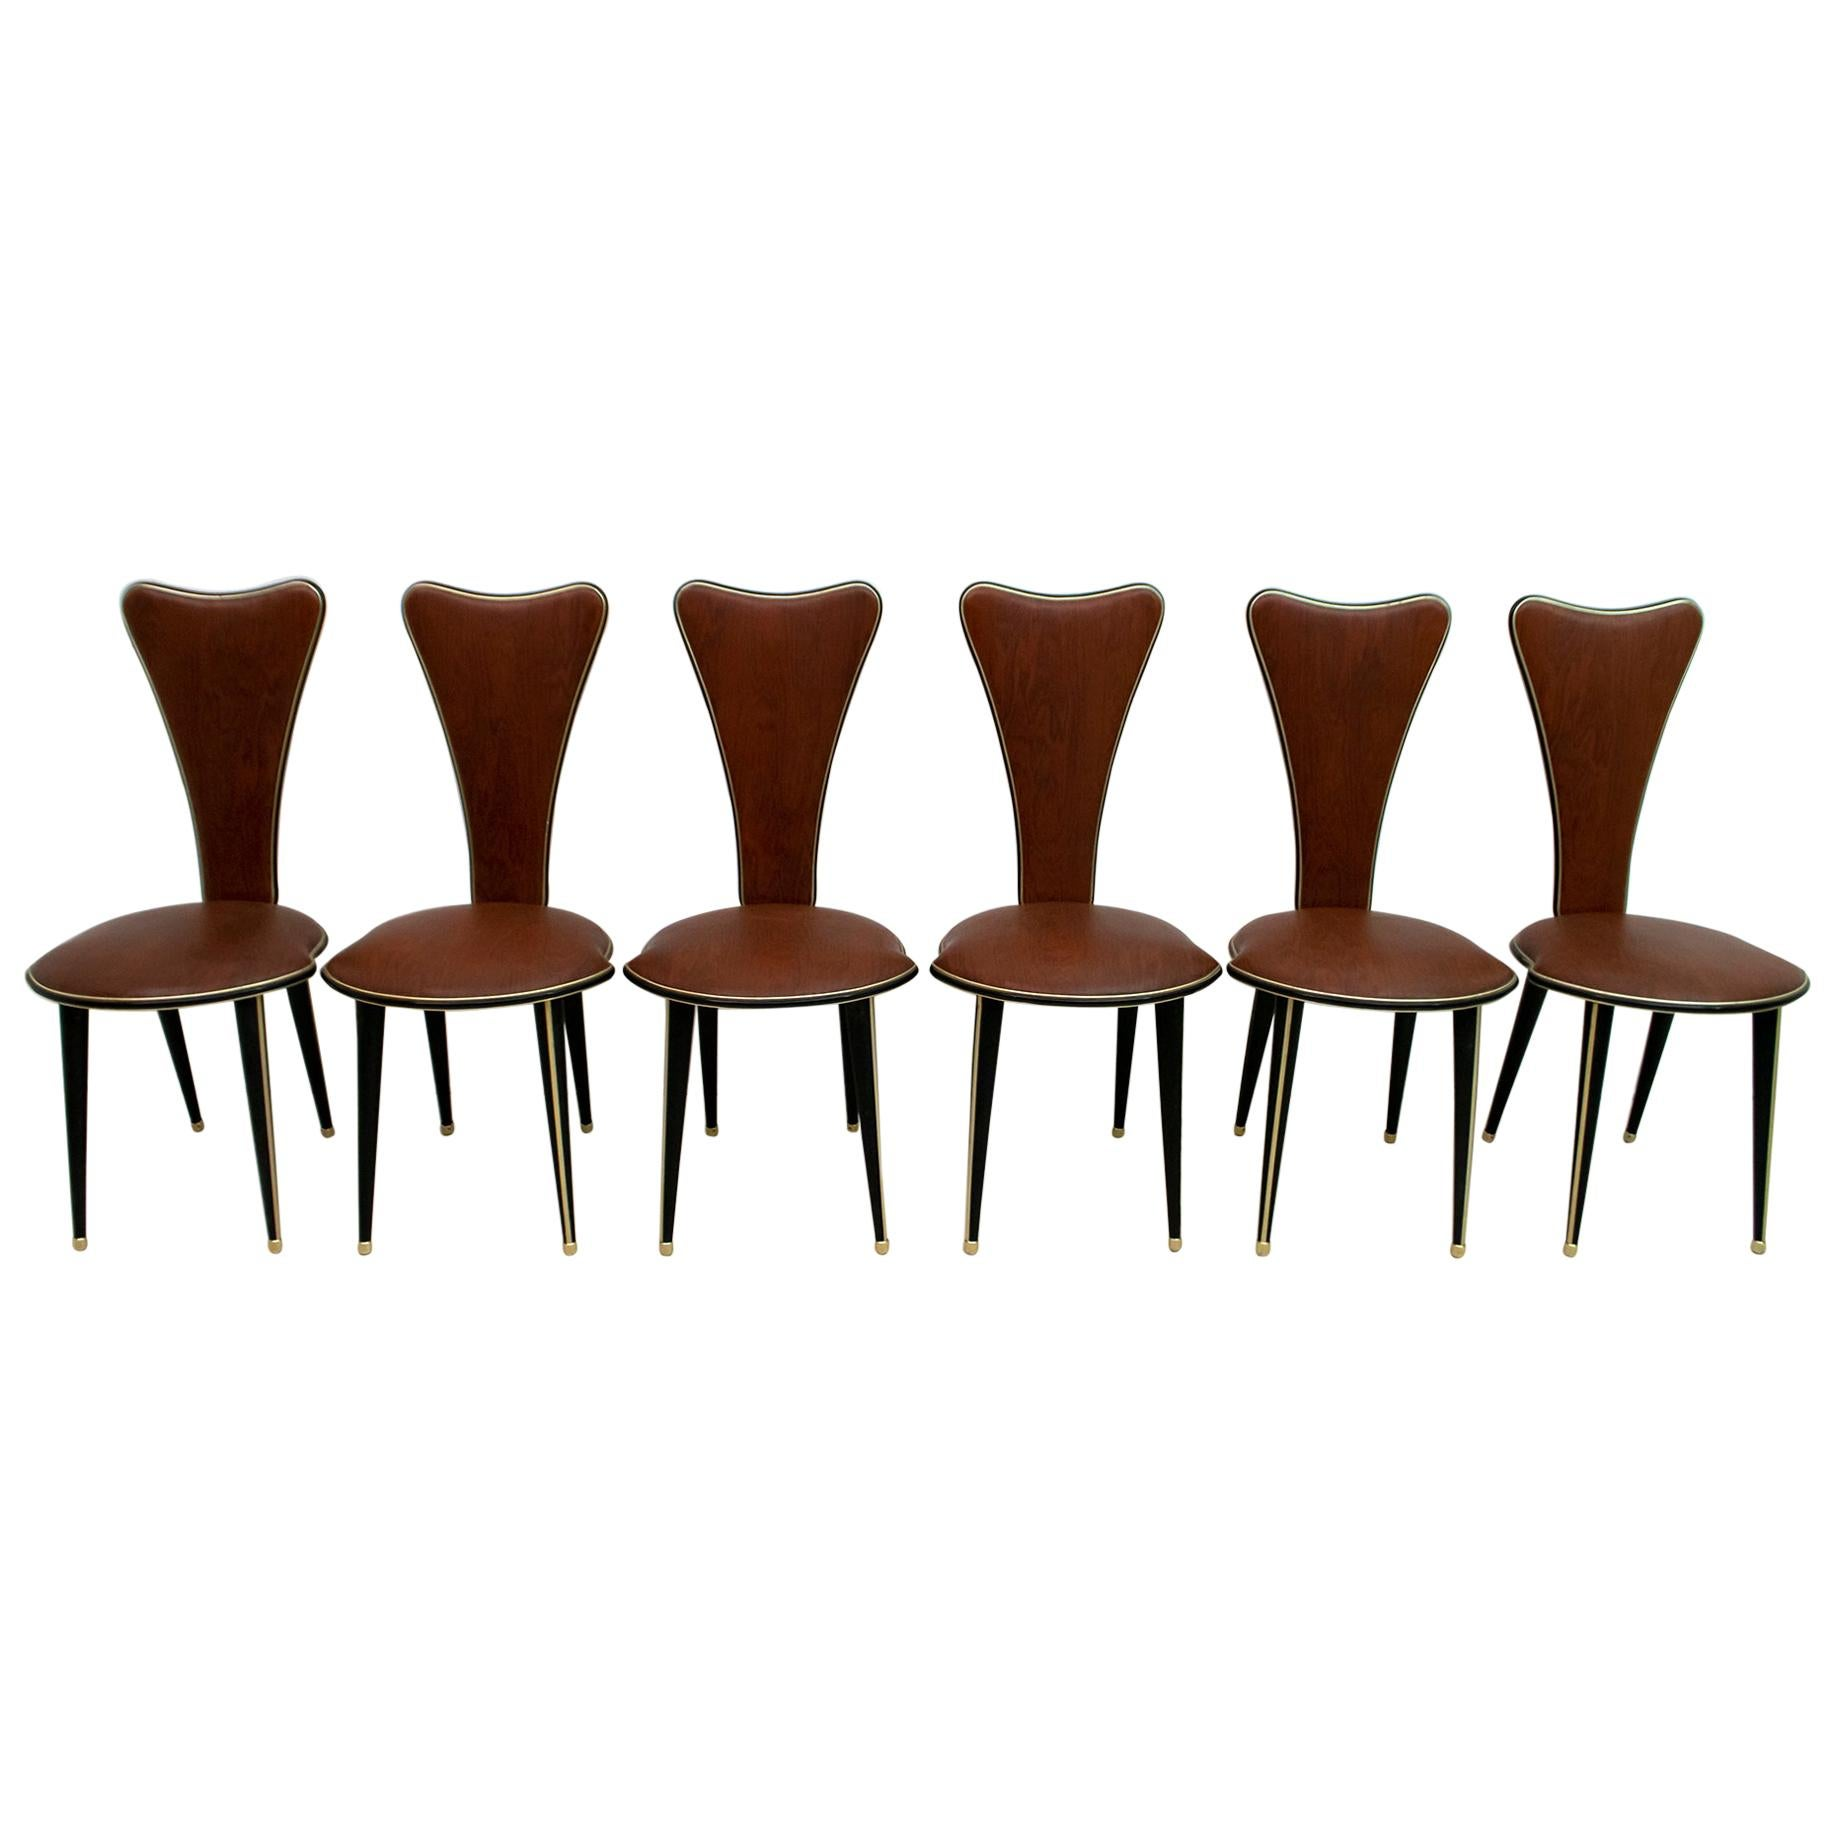 Umberto Mascagni for Harrods London Midcentury Modern Italian Dining Chairs, 50s